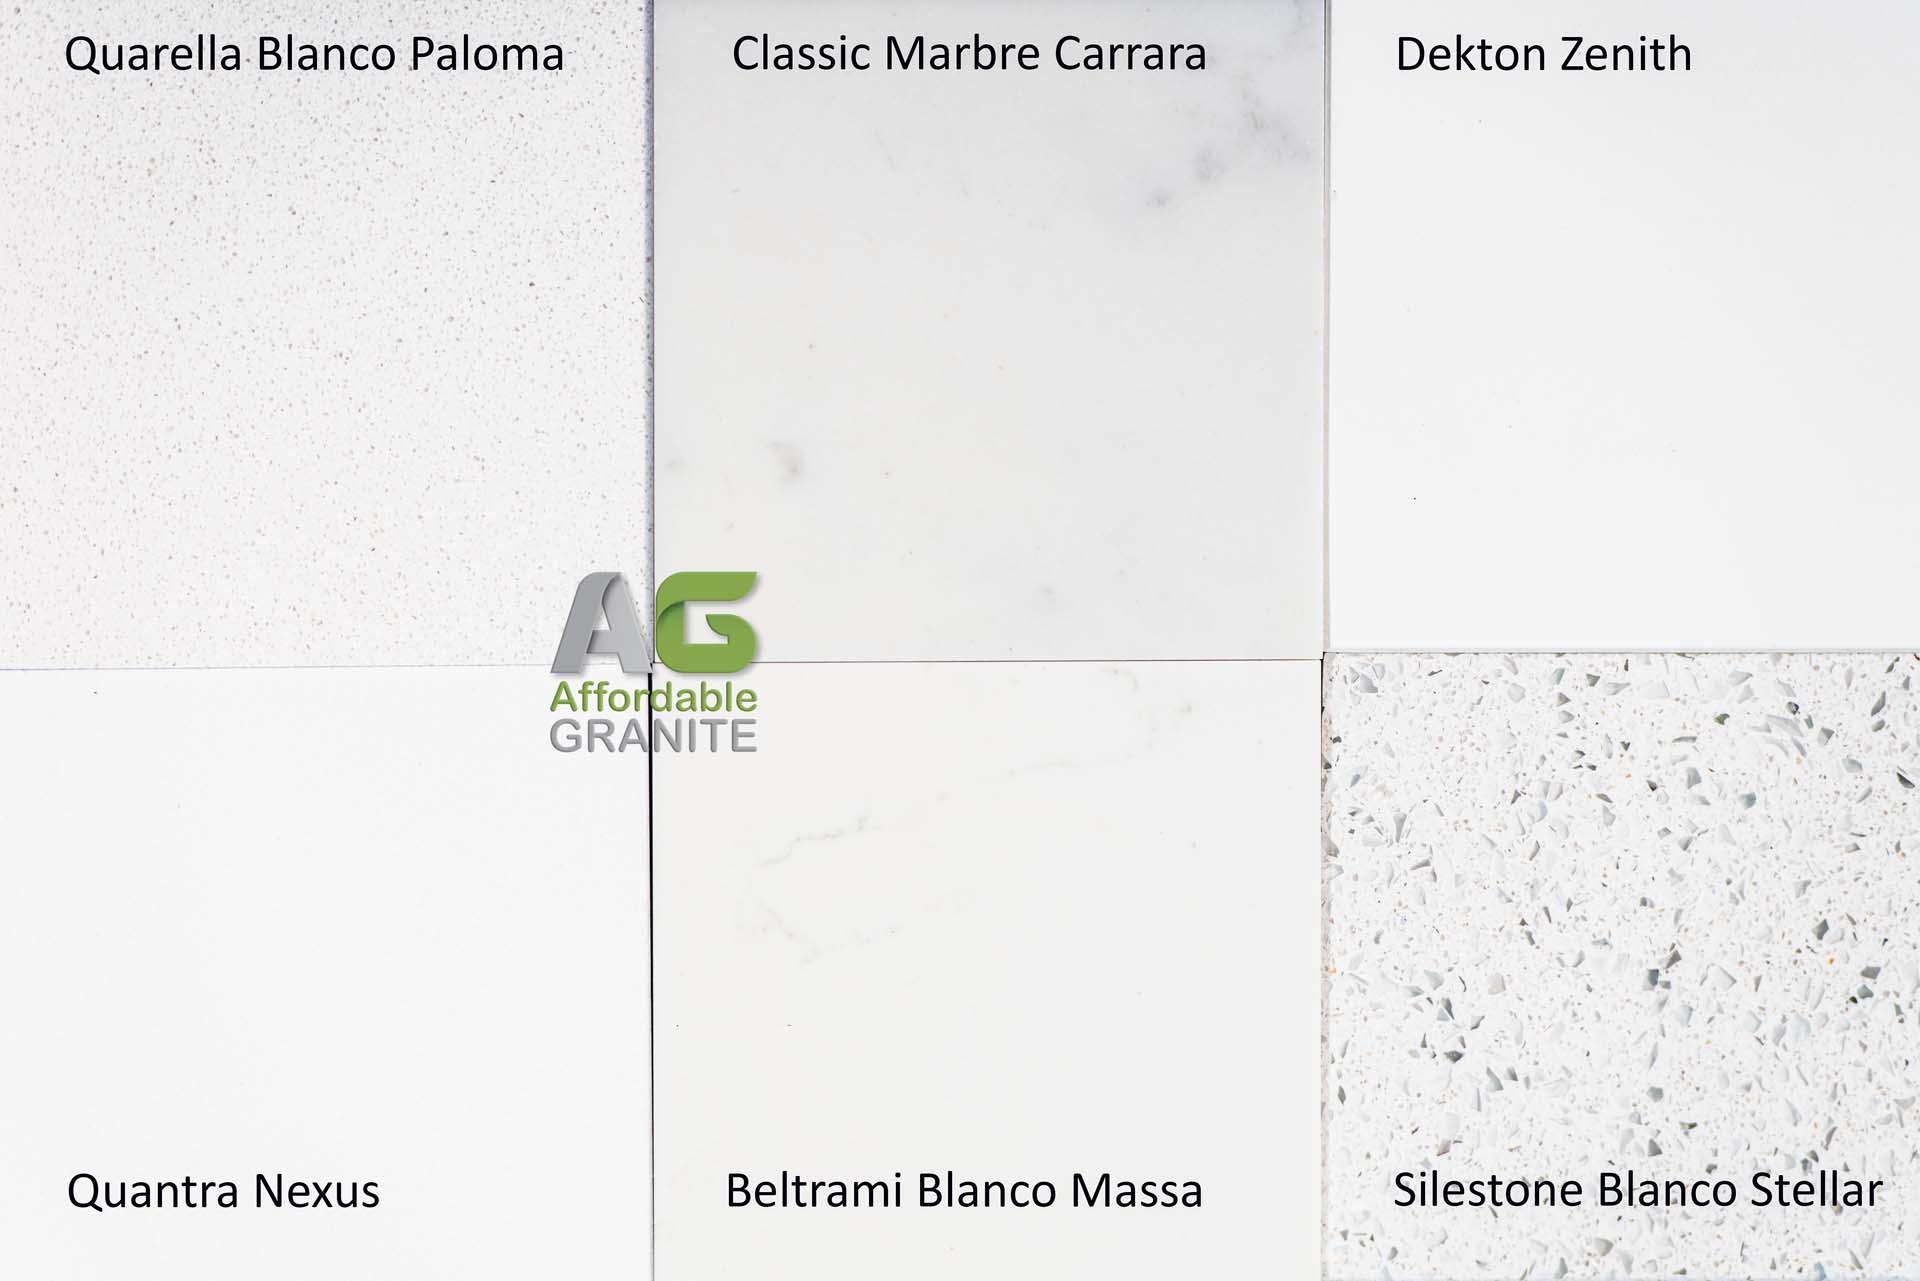 150430 quarella blanco paloma classic quartz marbre carrara dekton zenith quantra nexus beltrami blanco massa silestione blanco stellar